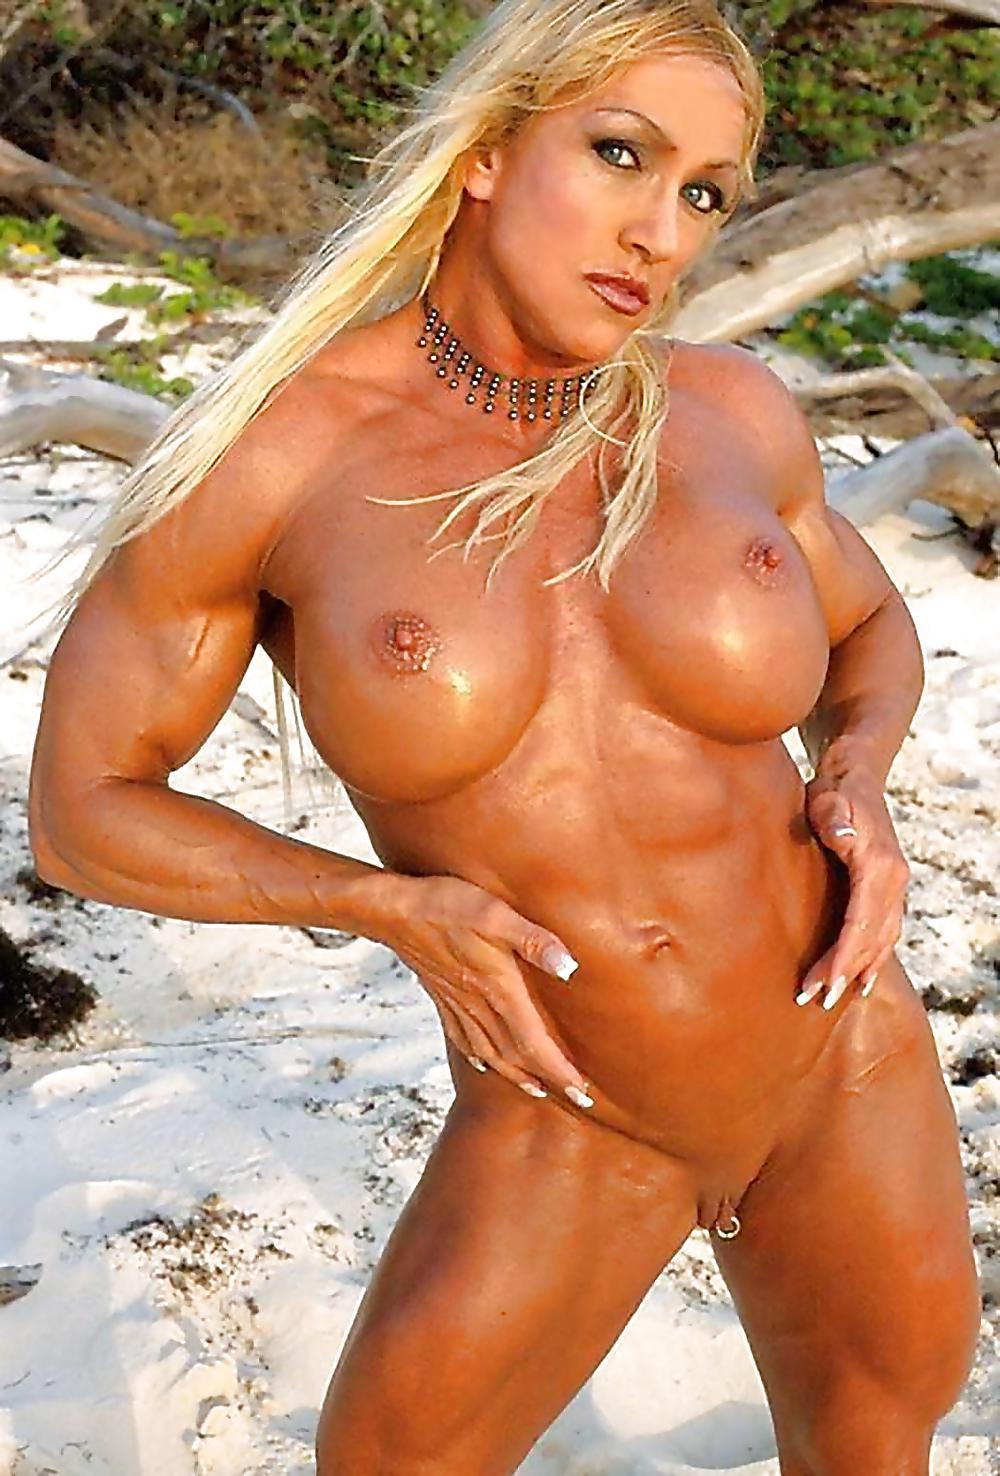 Nude pics of female bodybuilders